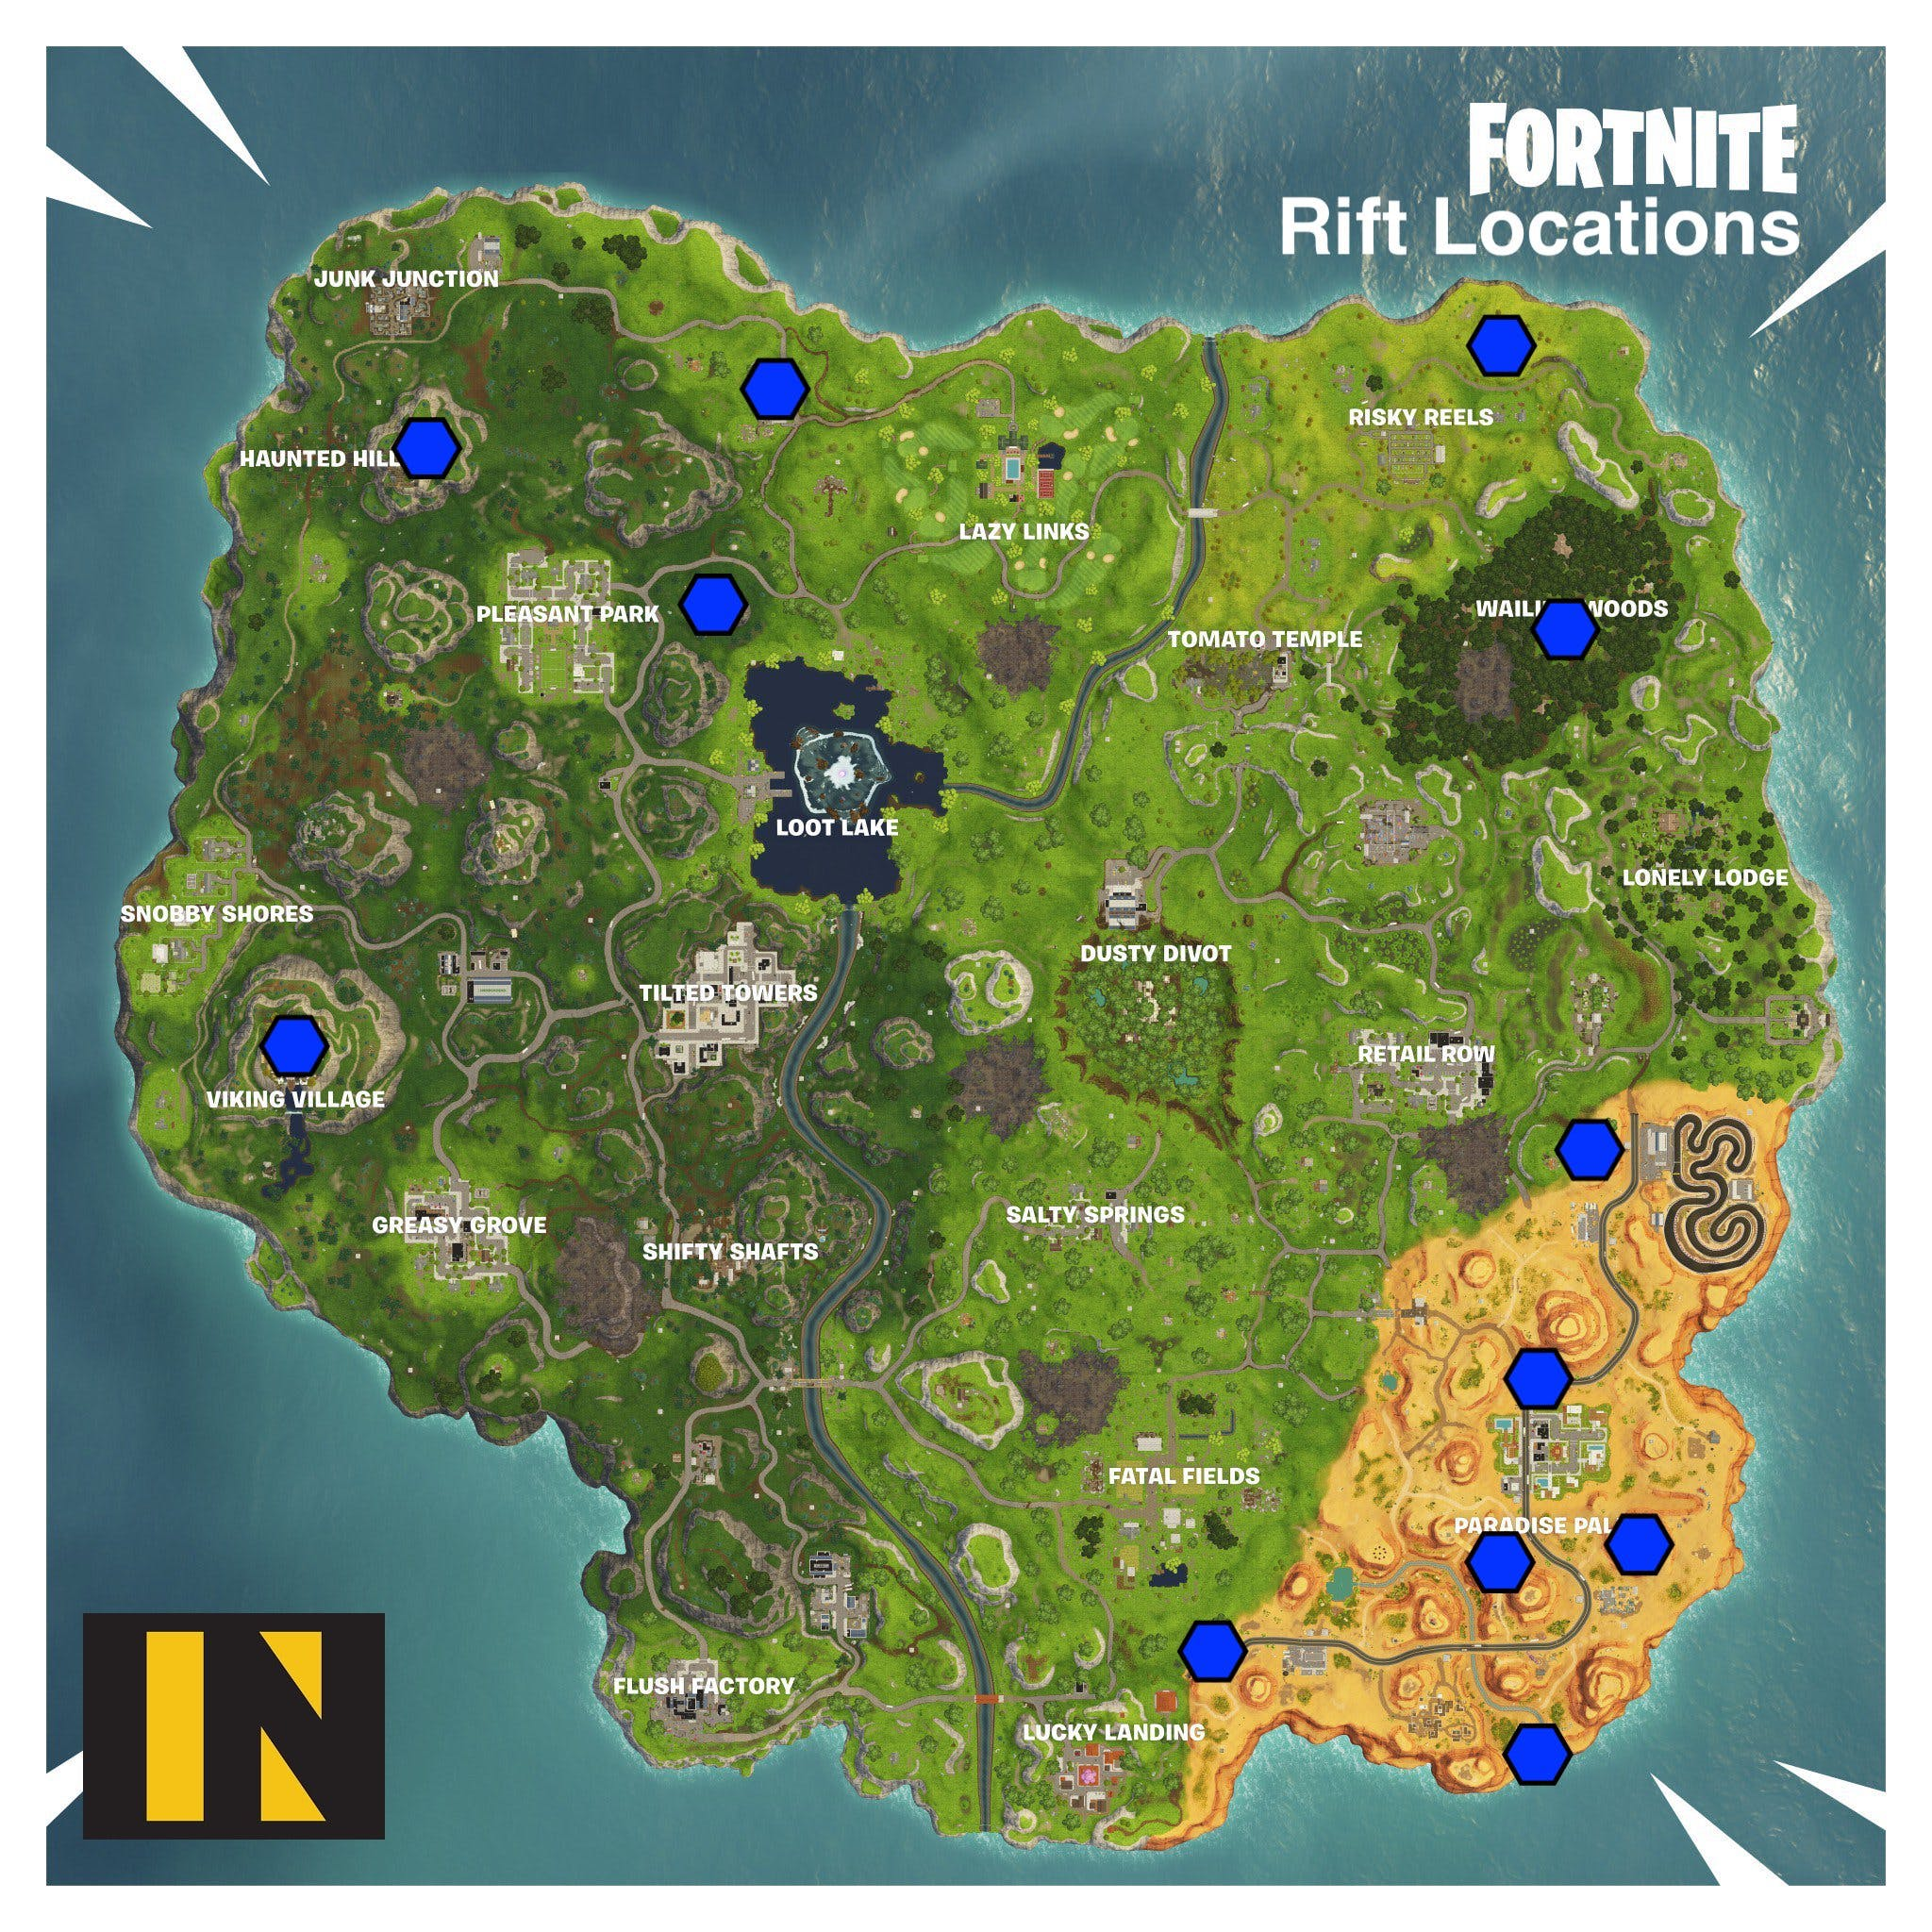 Fortnite Rift Locations Season 6 Map Shows Where All The Portals